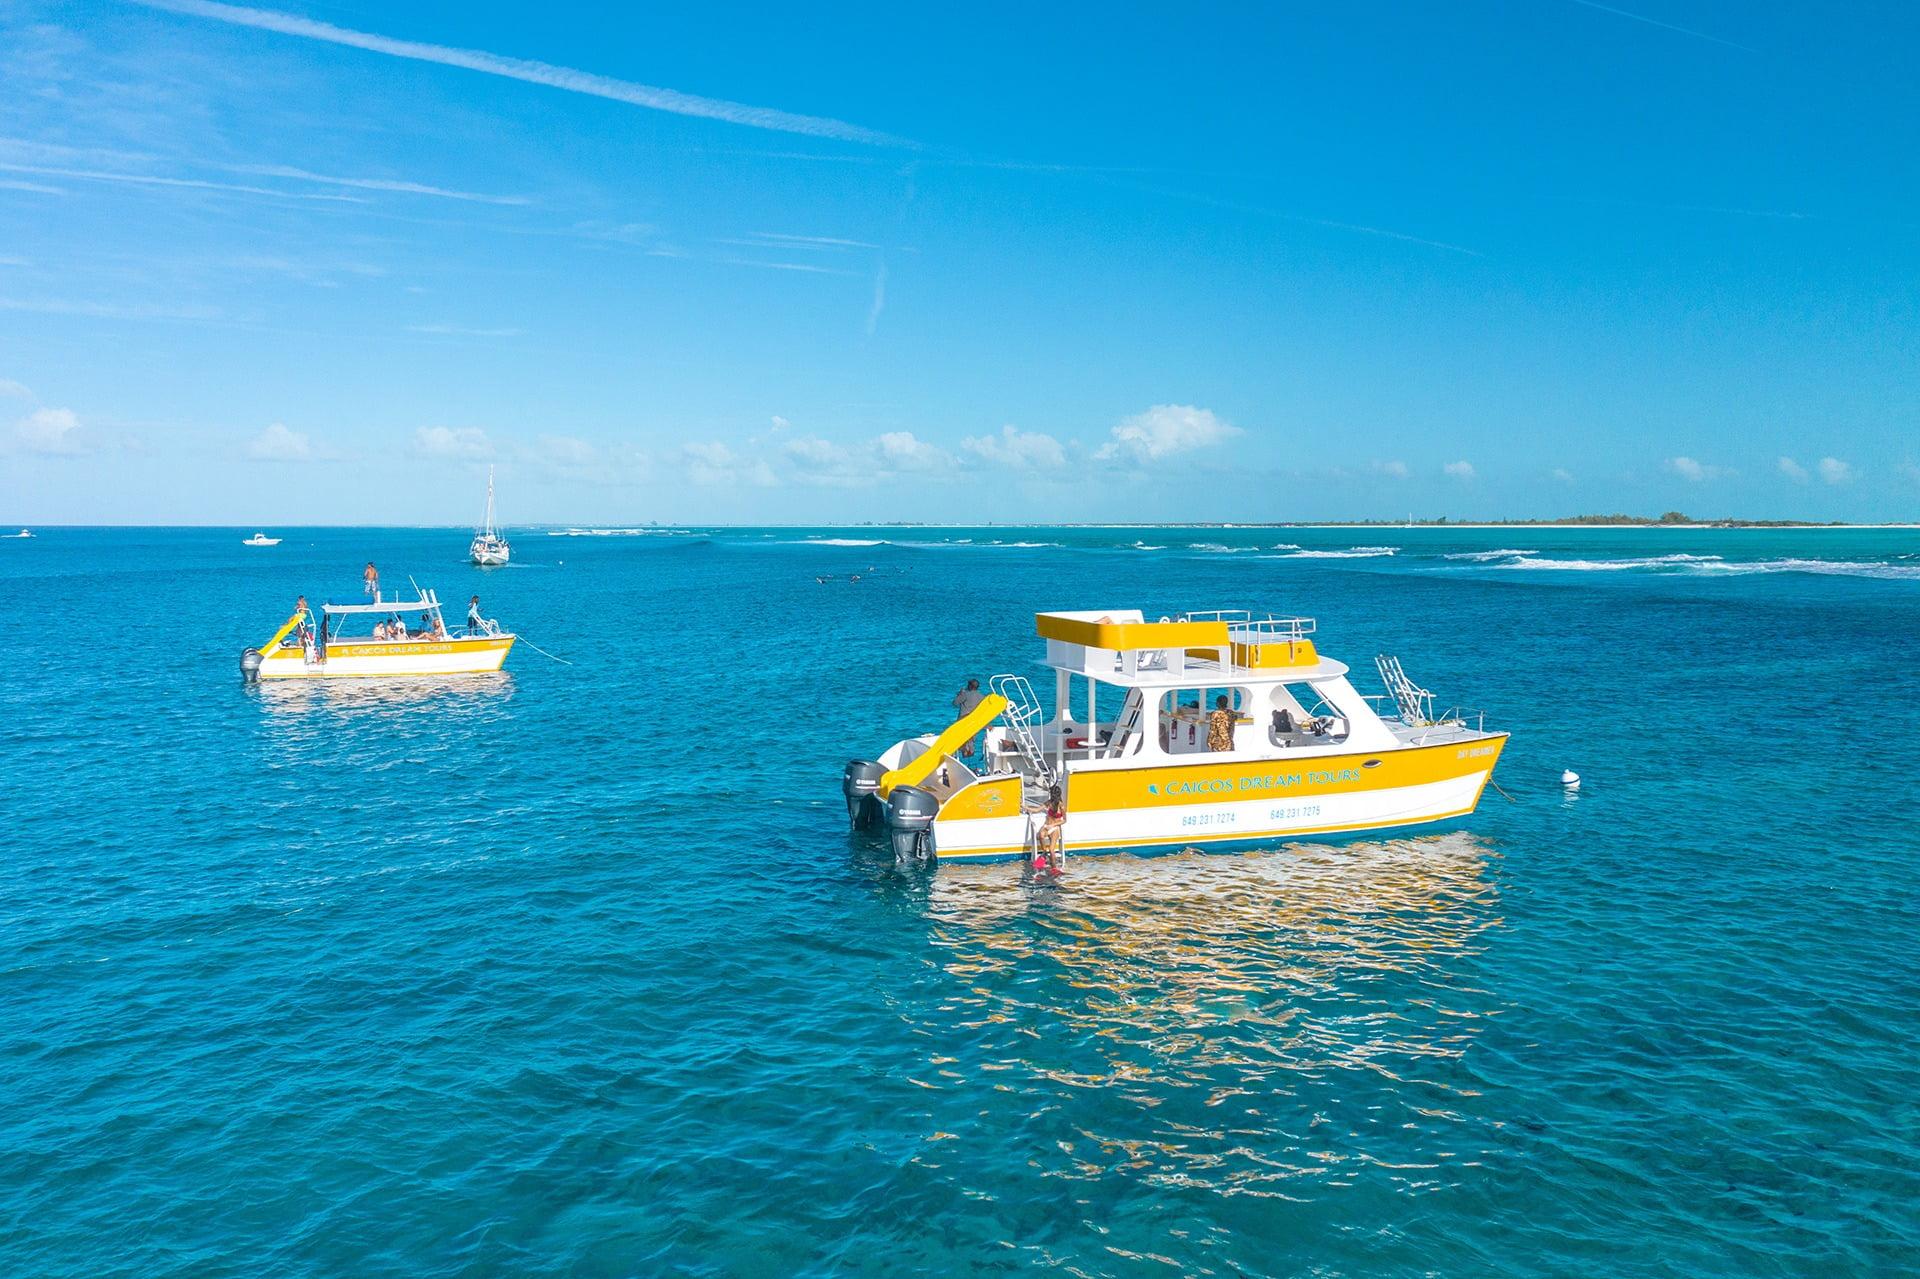 a private charter boat anchors near a sandbar